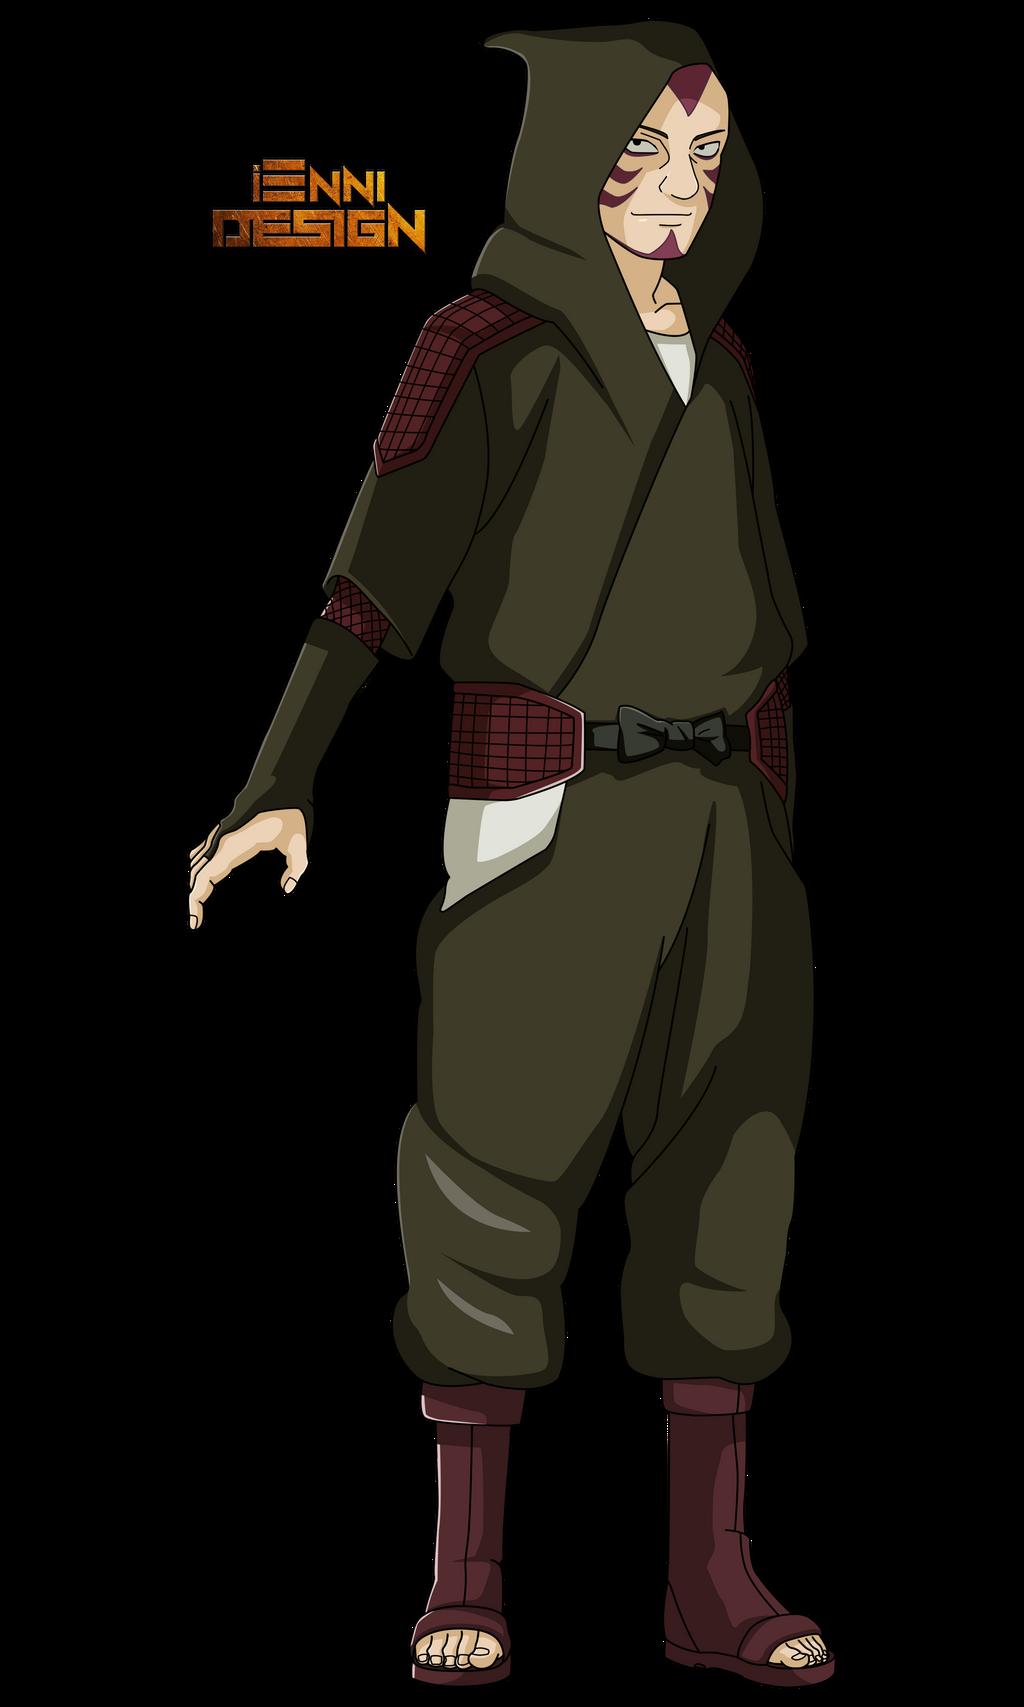 Boruto: The Next Generation|Kankuro by iEnniDESIGN on ... Gaara Blushing